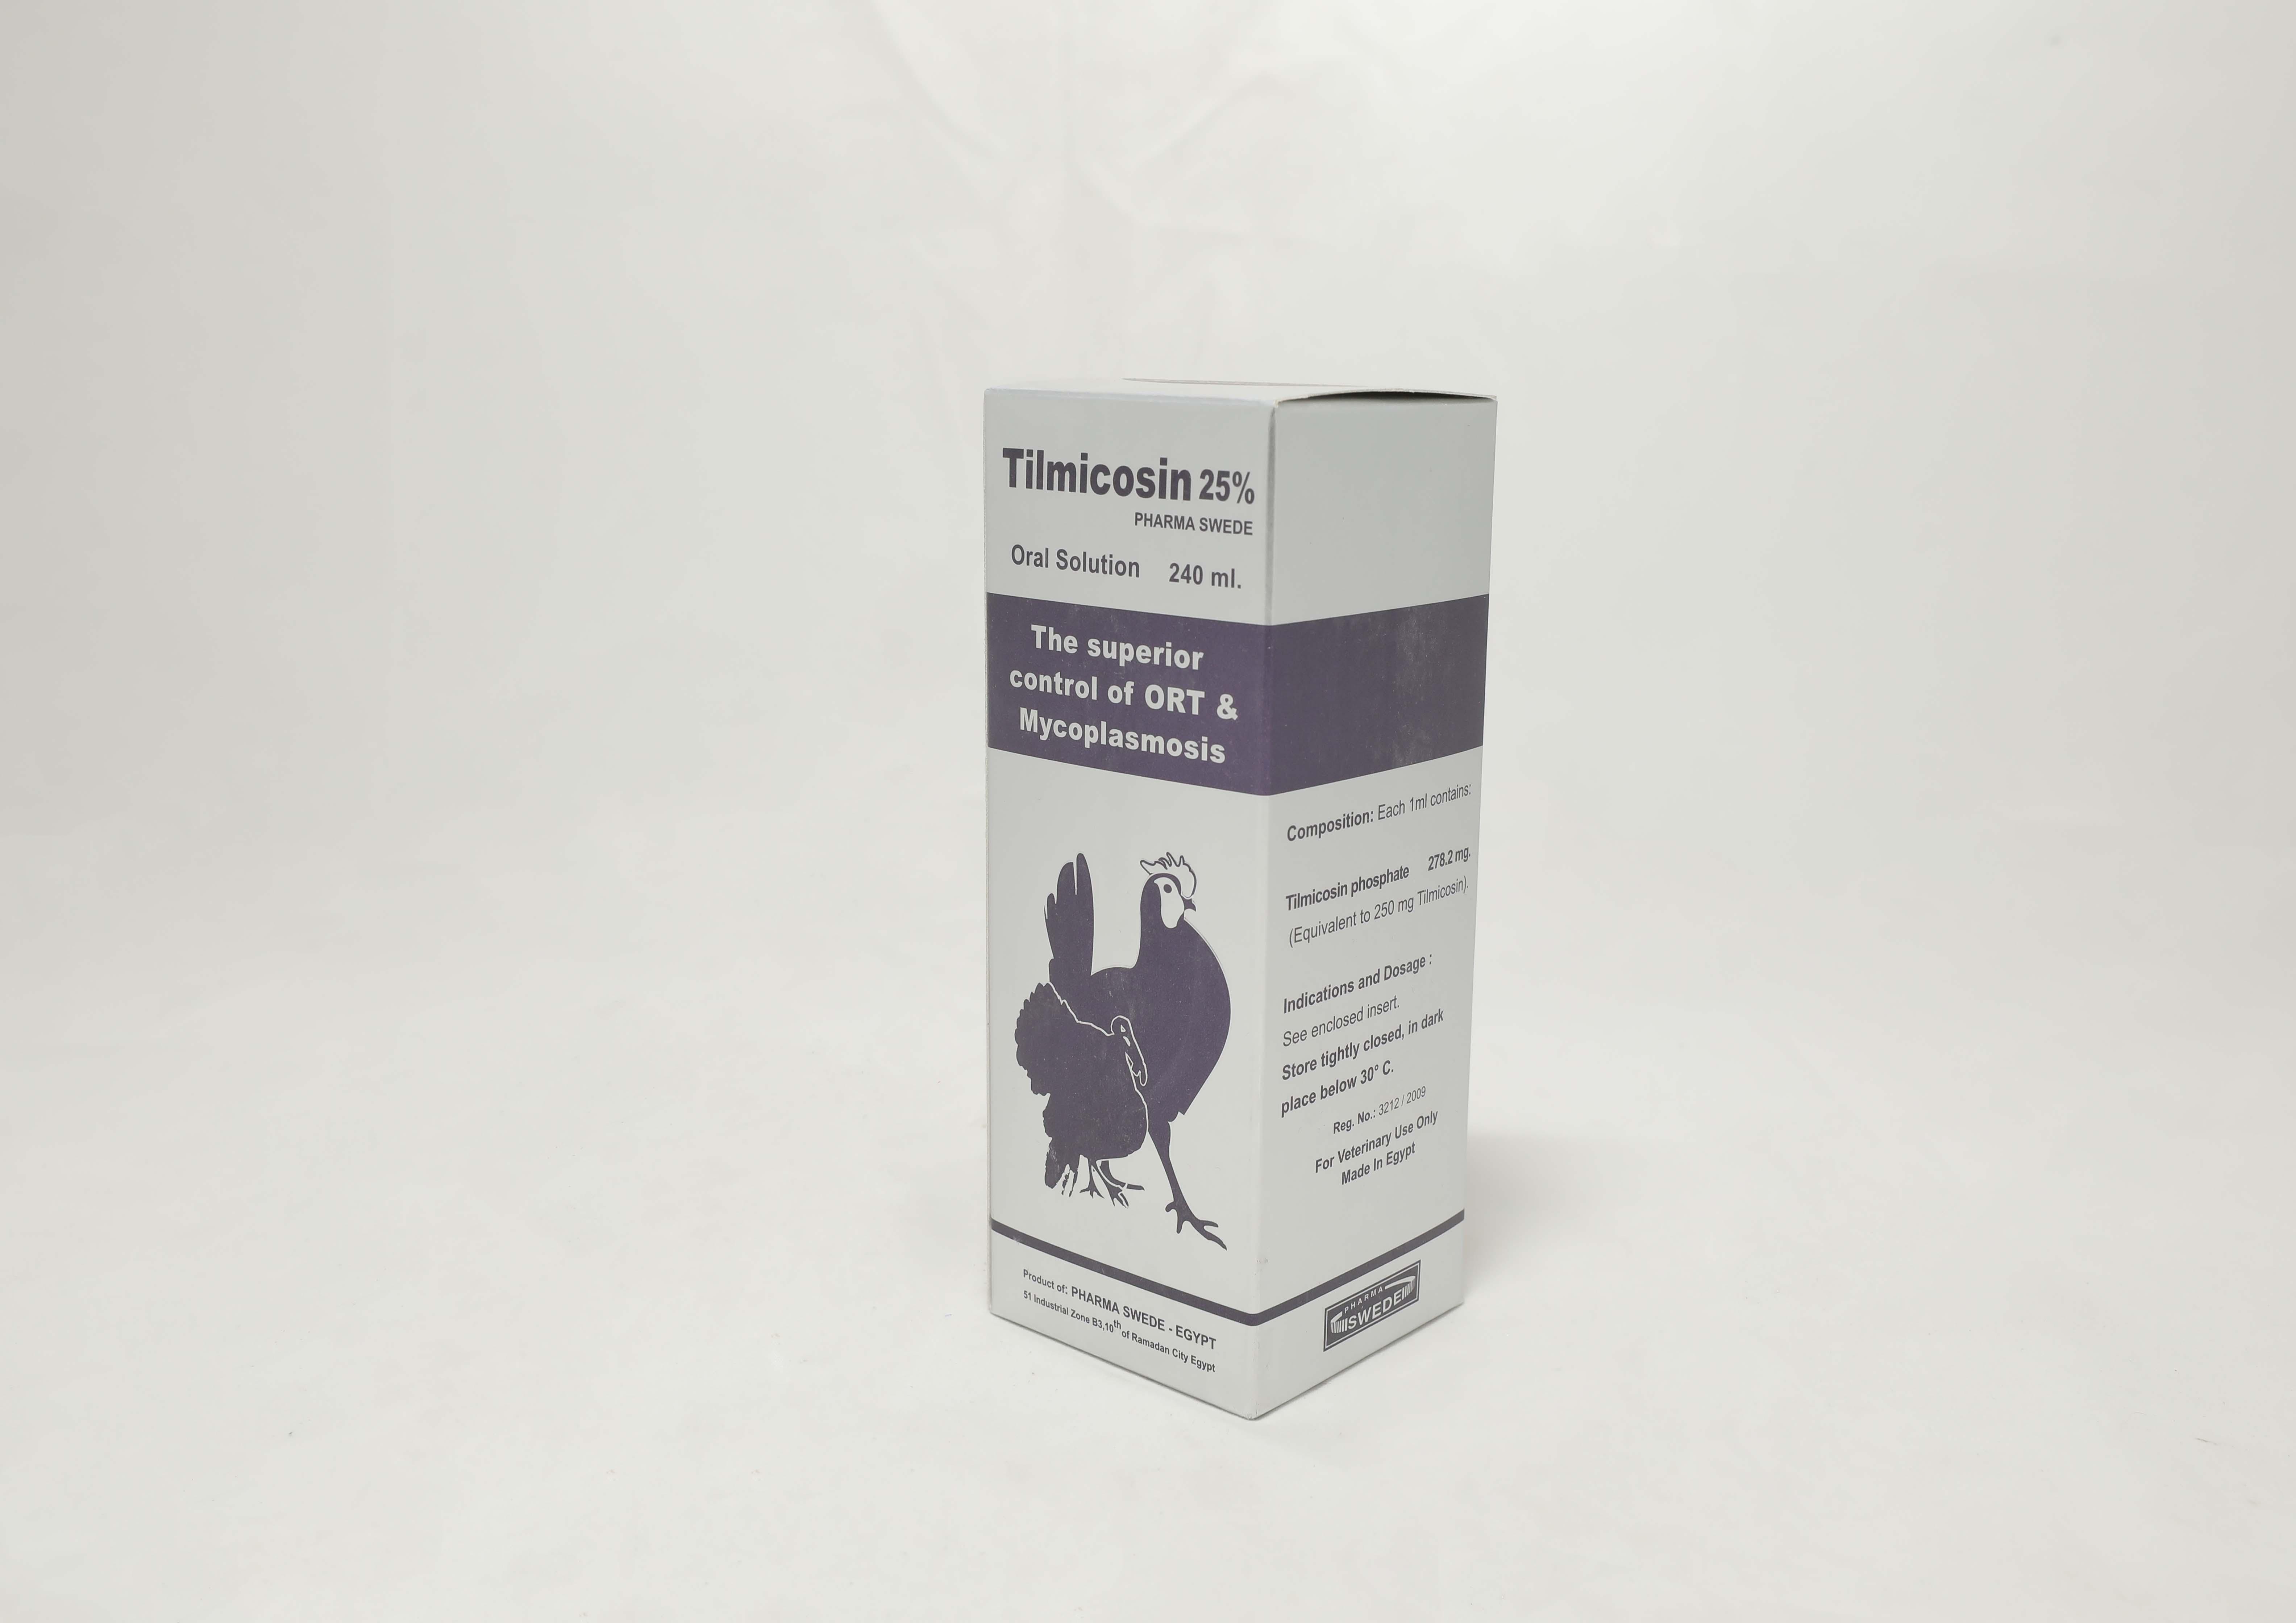 Tilmicosin 25% Pharma Swede